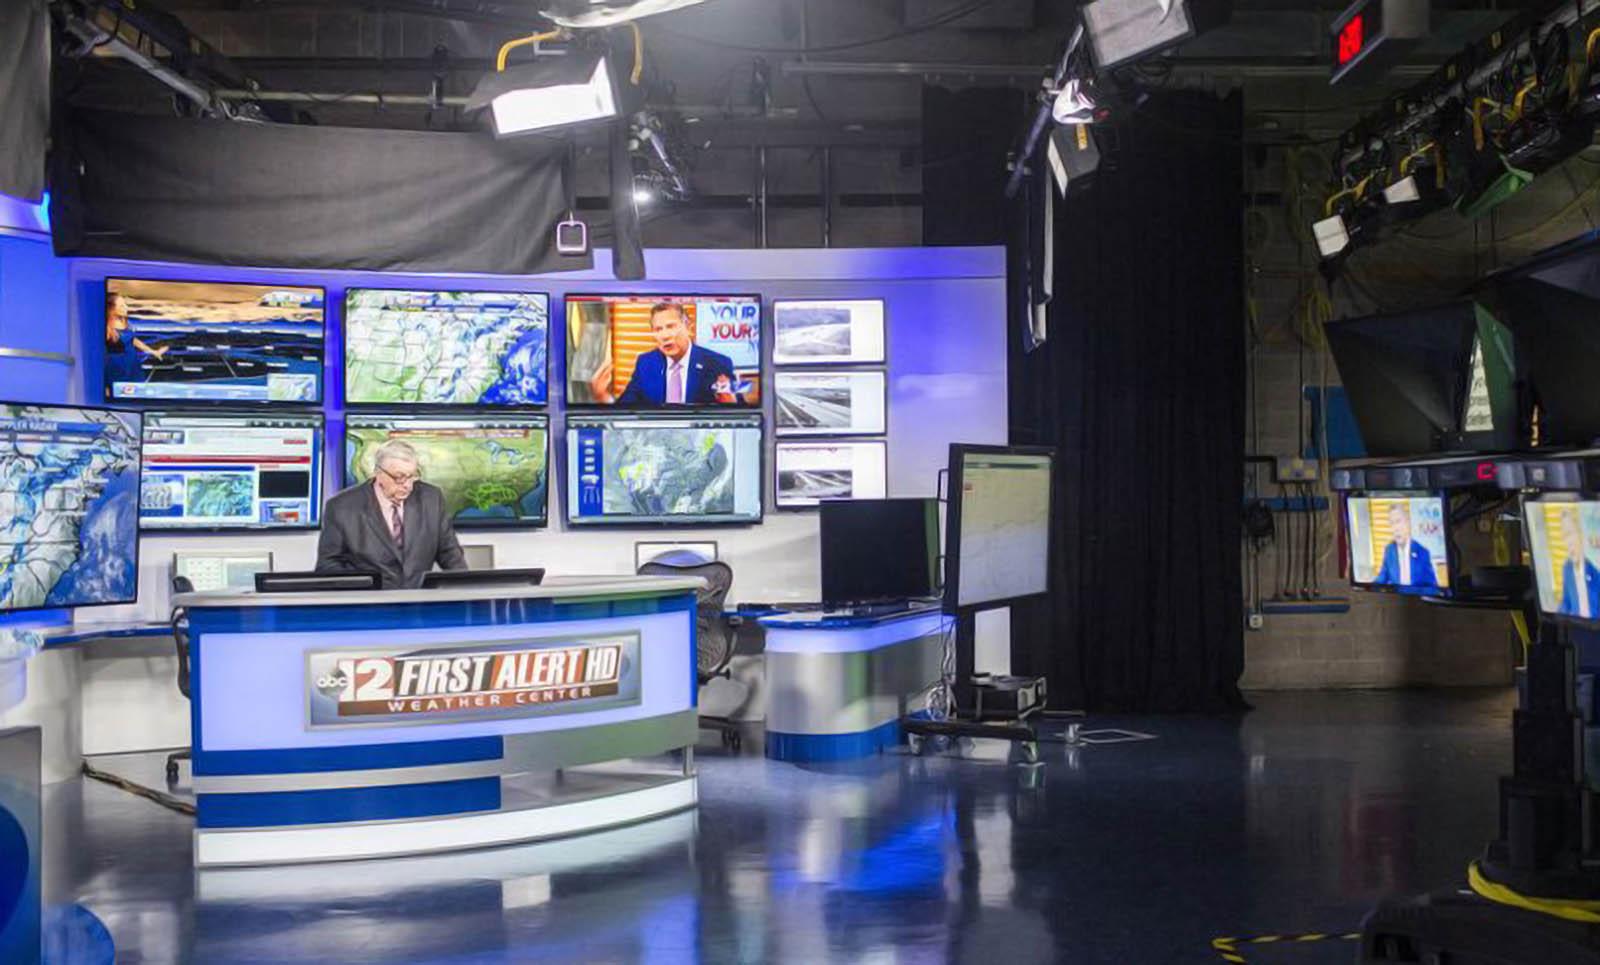 WJRT ABC12 News weather studio